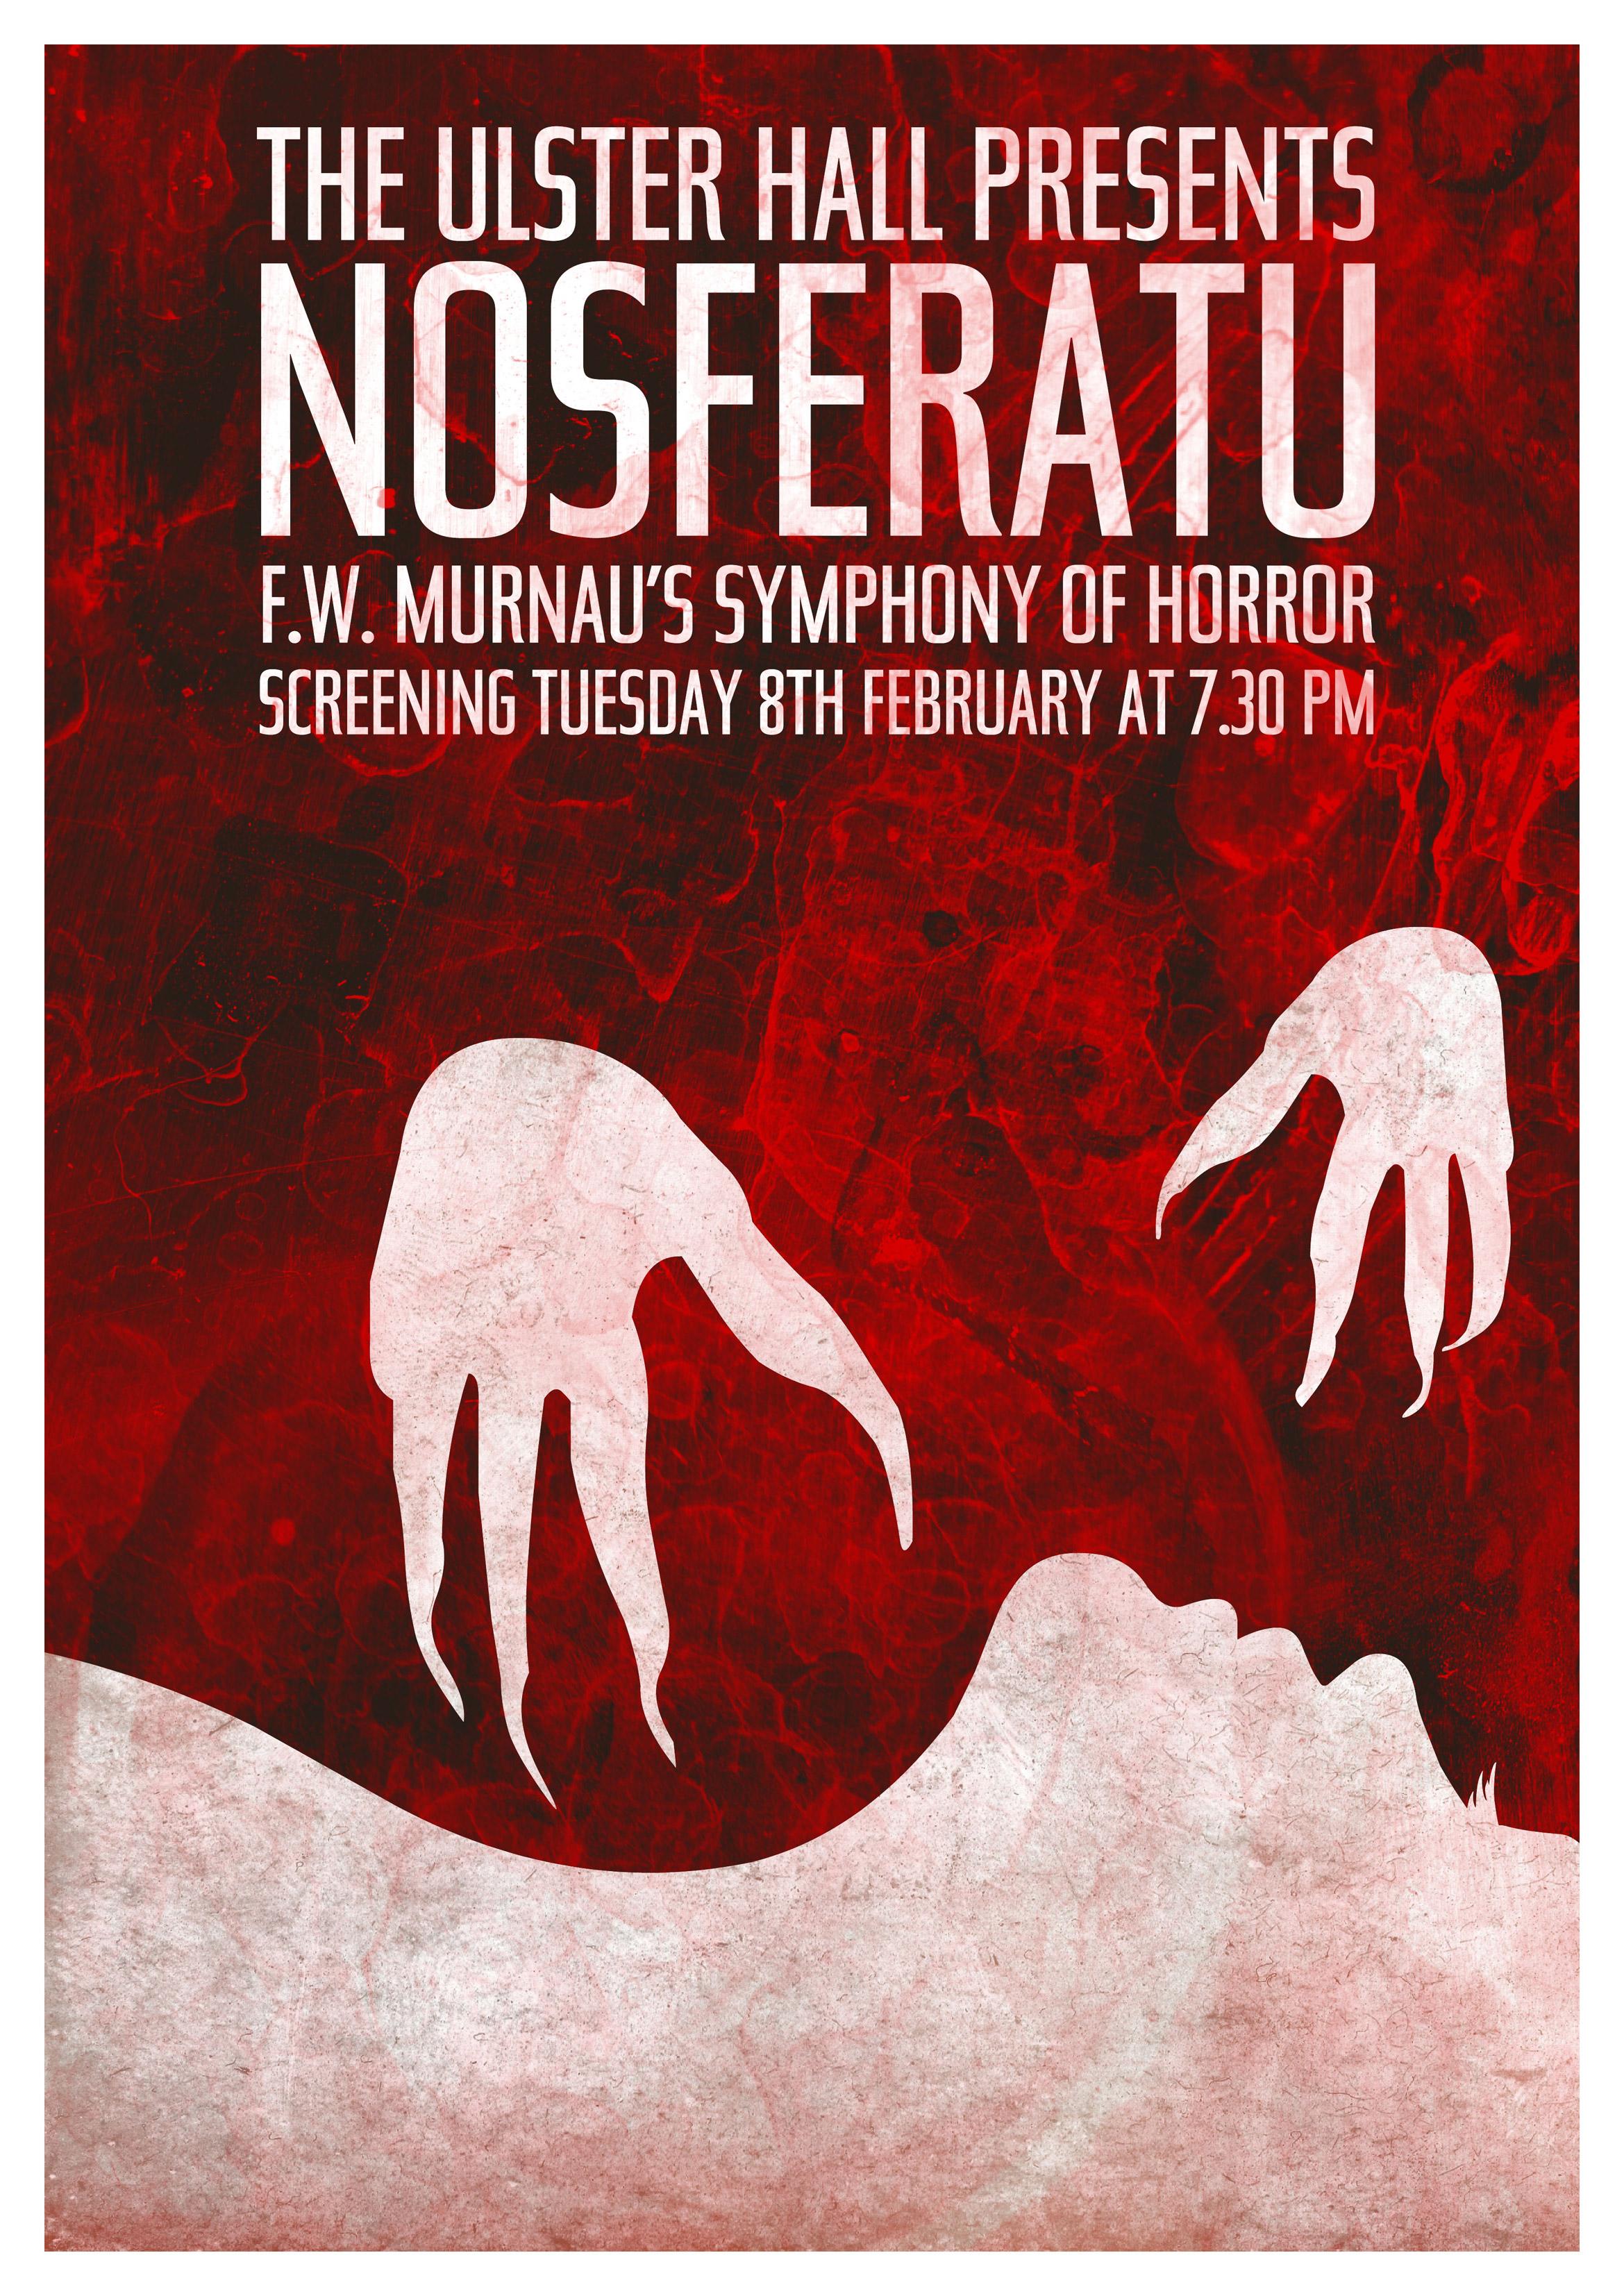 Nosferatu (1922) poster by Conor Bryce, 2011